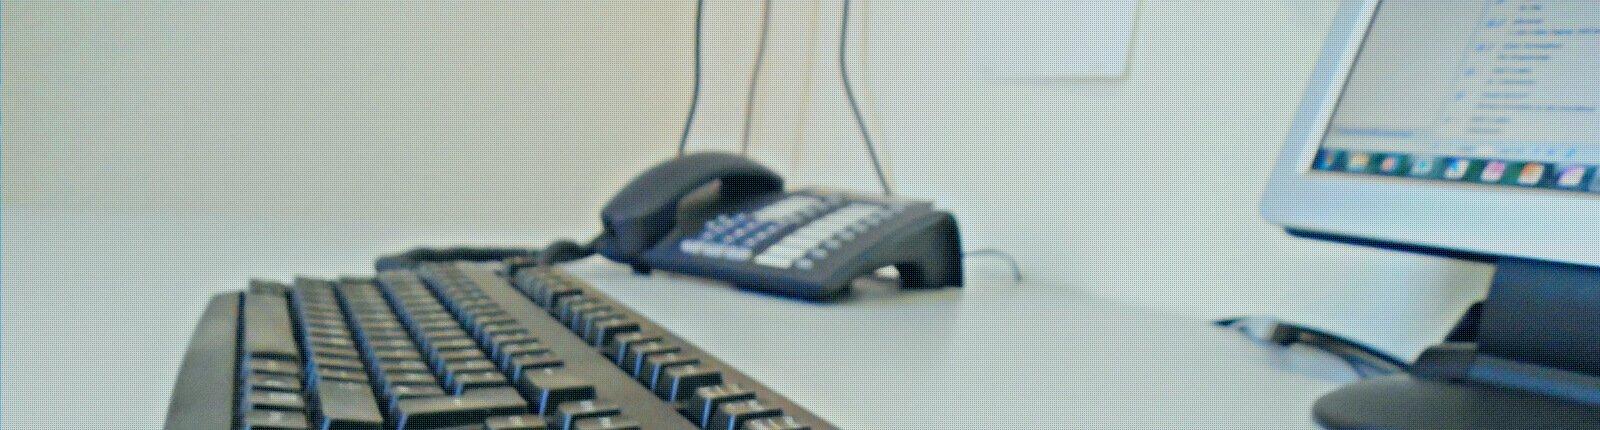 Виртуальная АТС - это шаг вперед